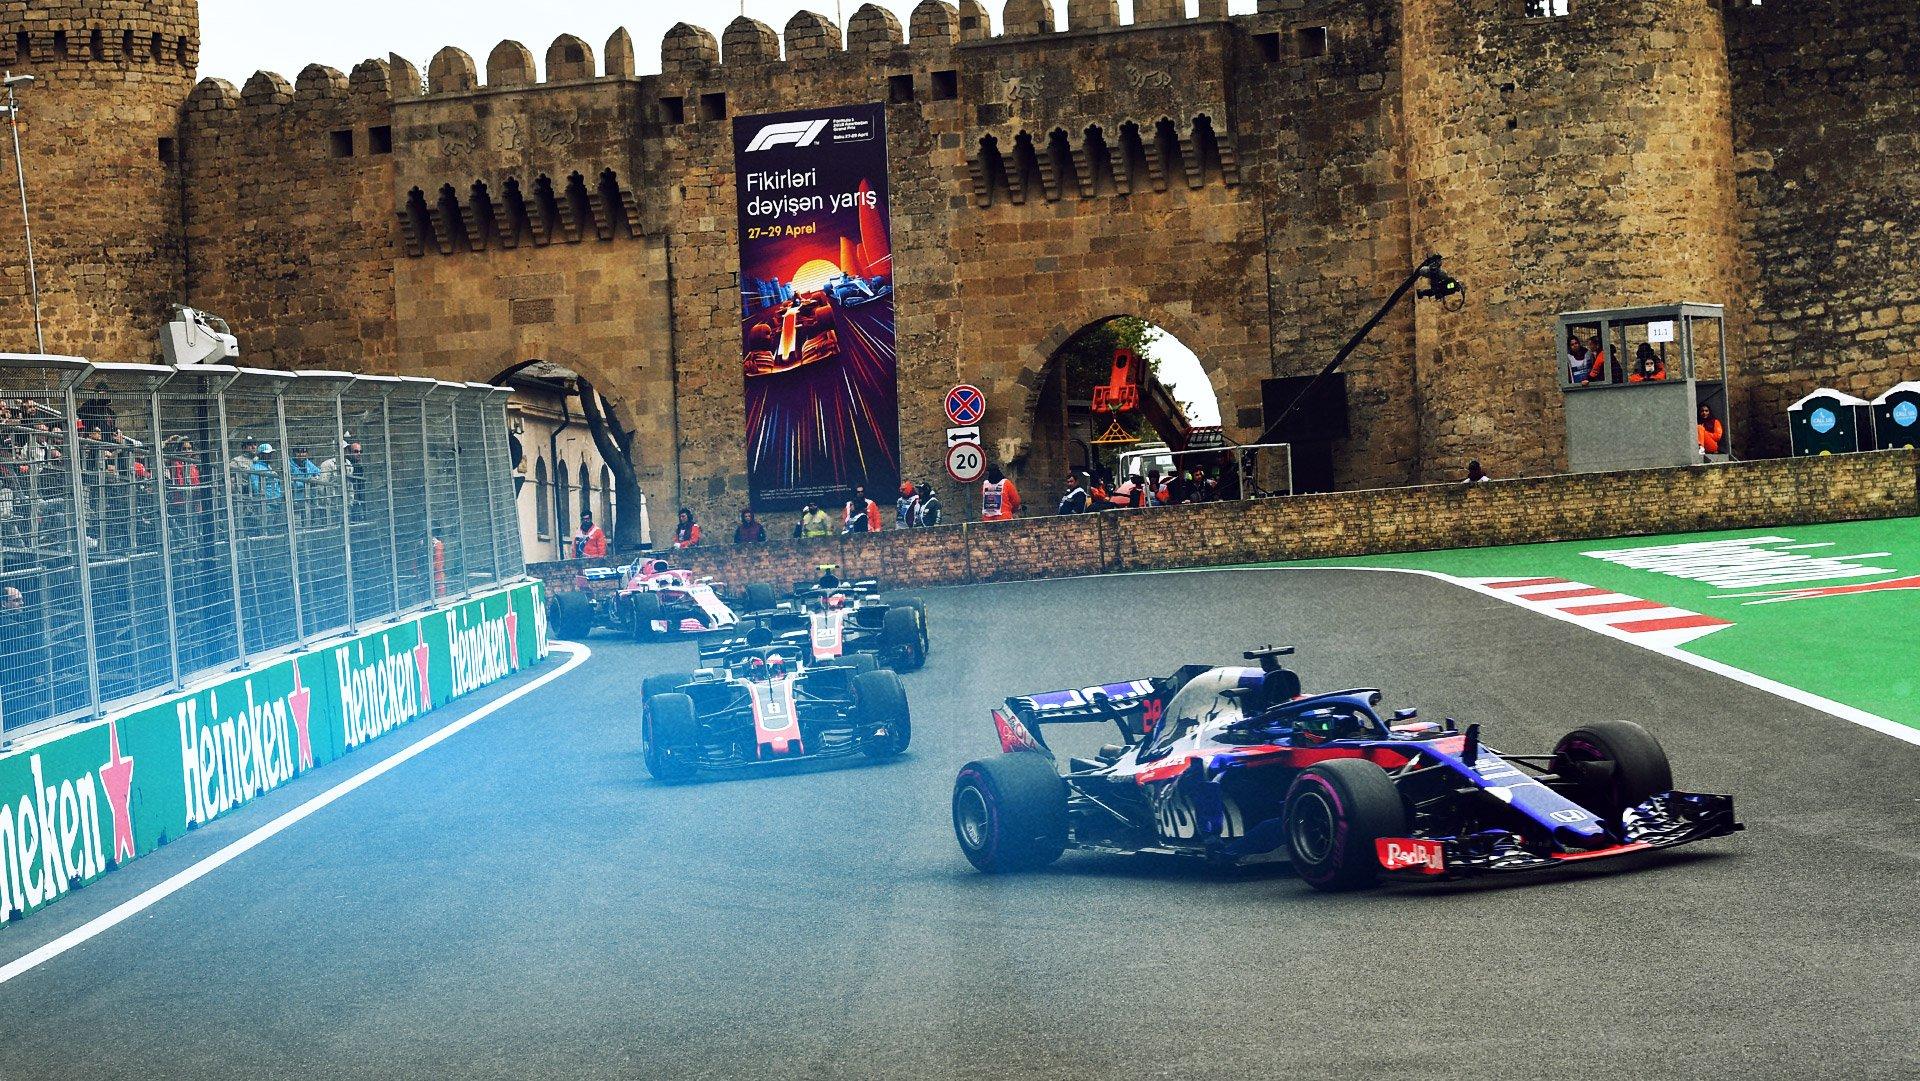 F1 Schedule 2019 – Official Calendar Of Grand Prix Races Formula 1 Calendar 2019 Tickets